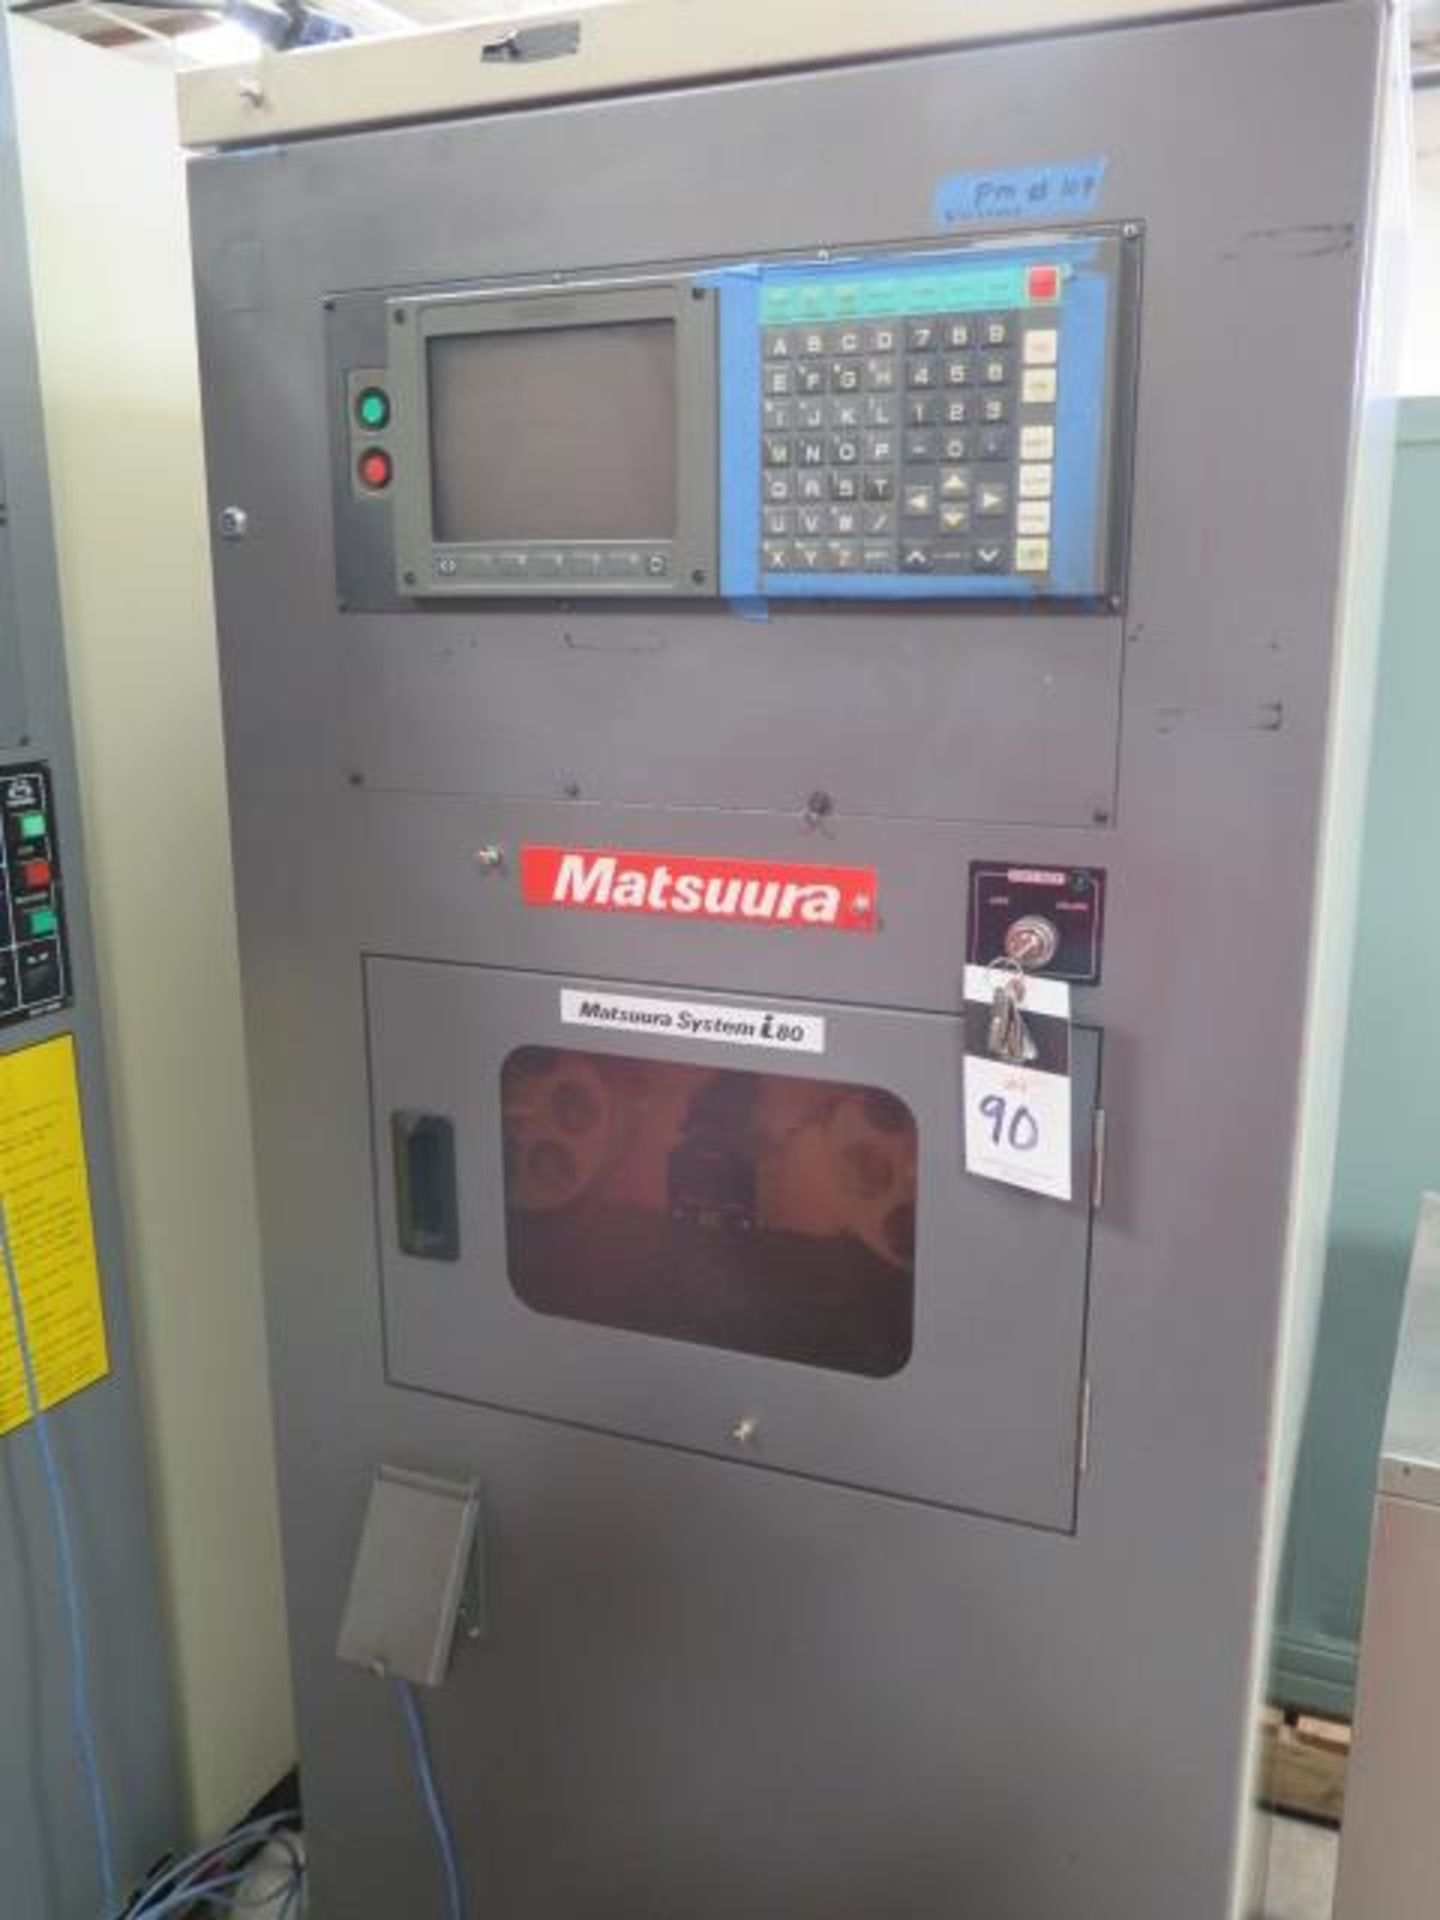 1992 Matsuura MC-450H-30-PC II 10-Pallet CNC Horizontal Machining Center s/n 910609609, SOLD AS IS - Image 4 of 23